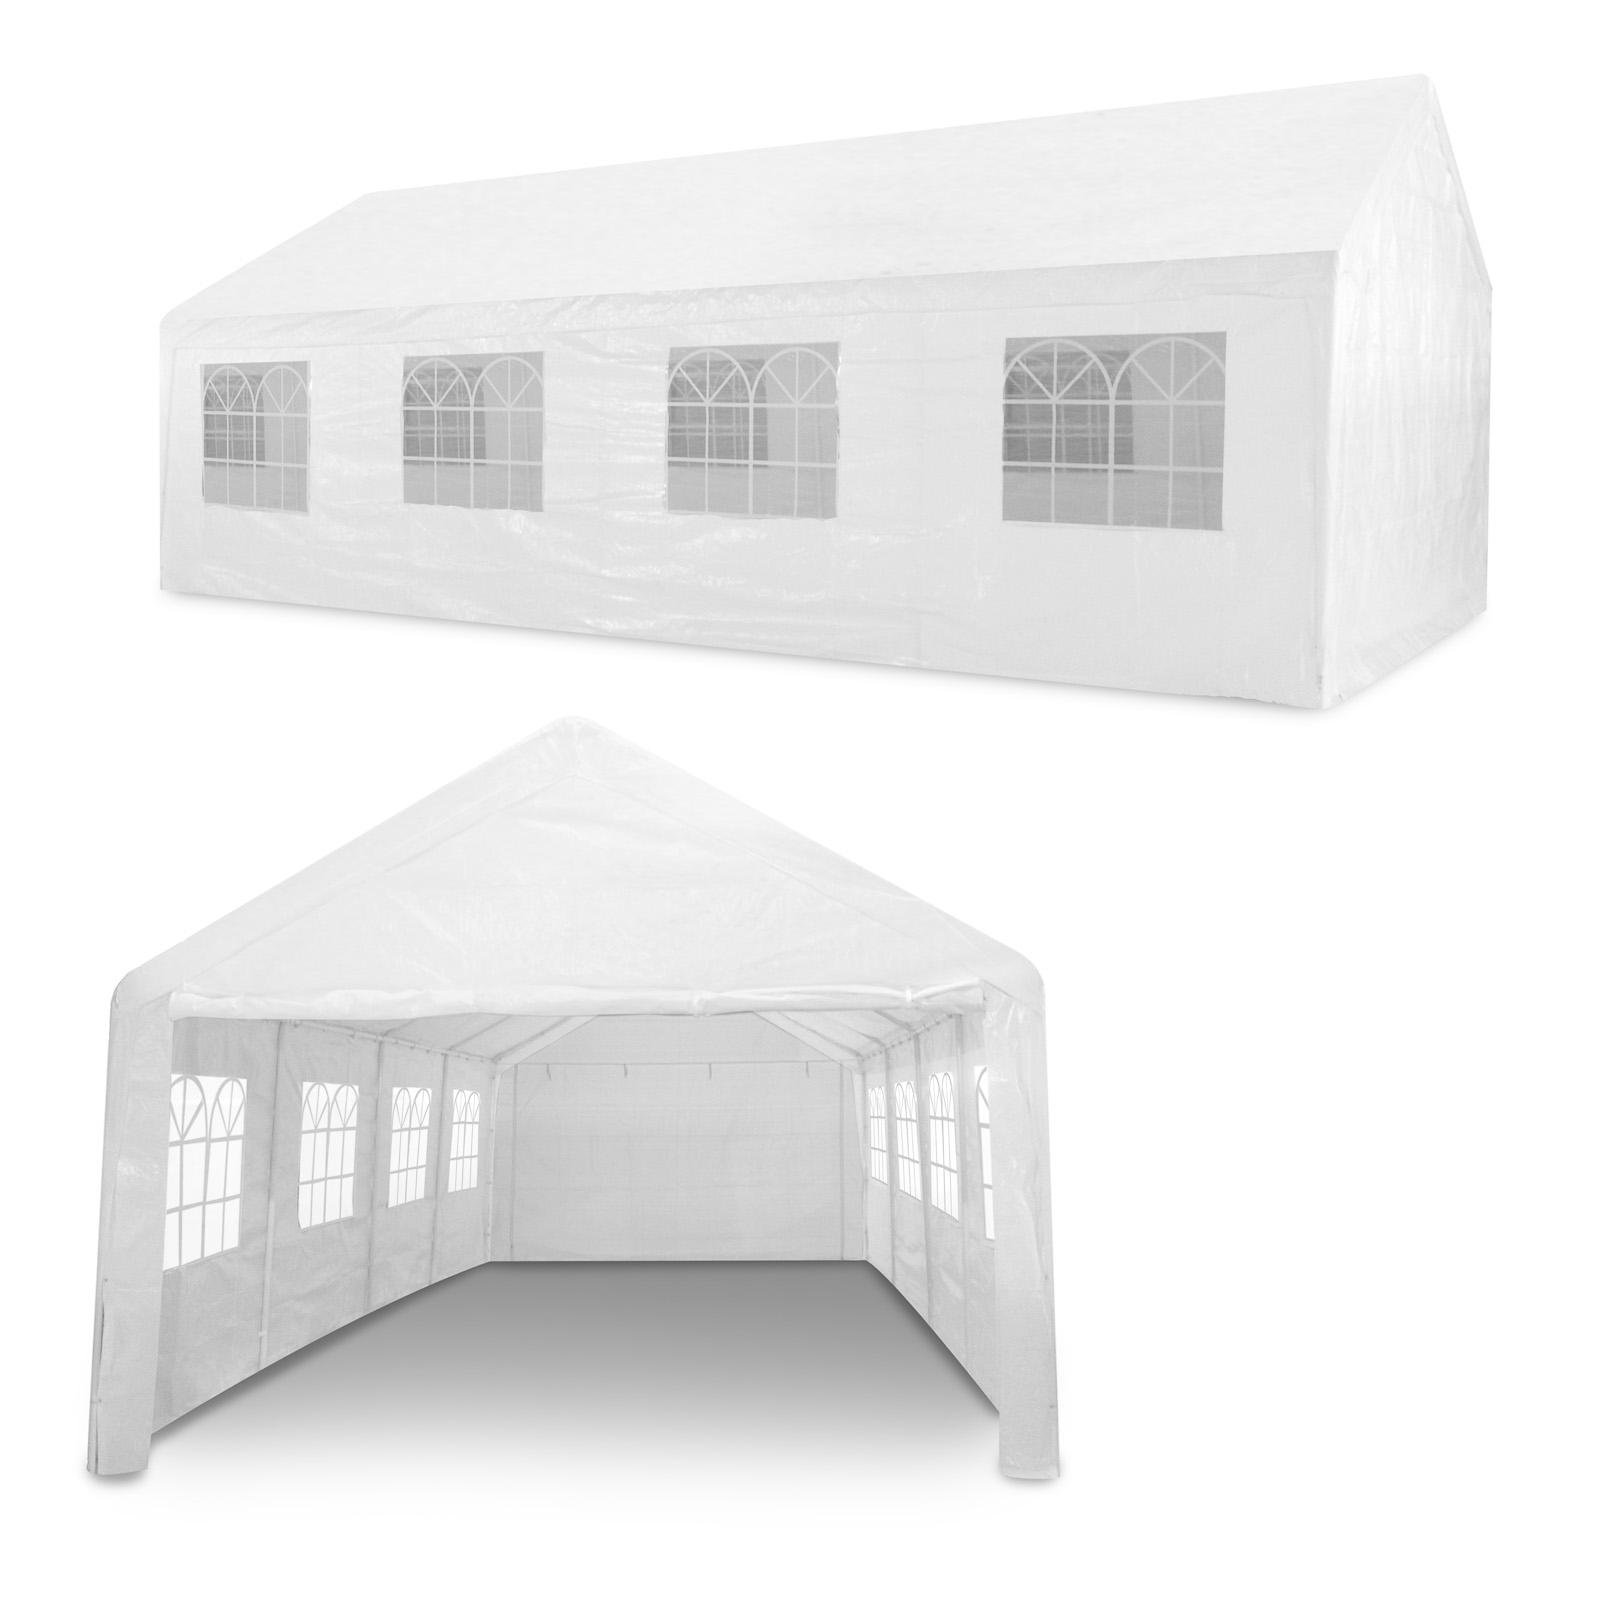 Gartenzelt Groß : Partyzelt pavillon festzelt gartenzelt drei größen m